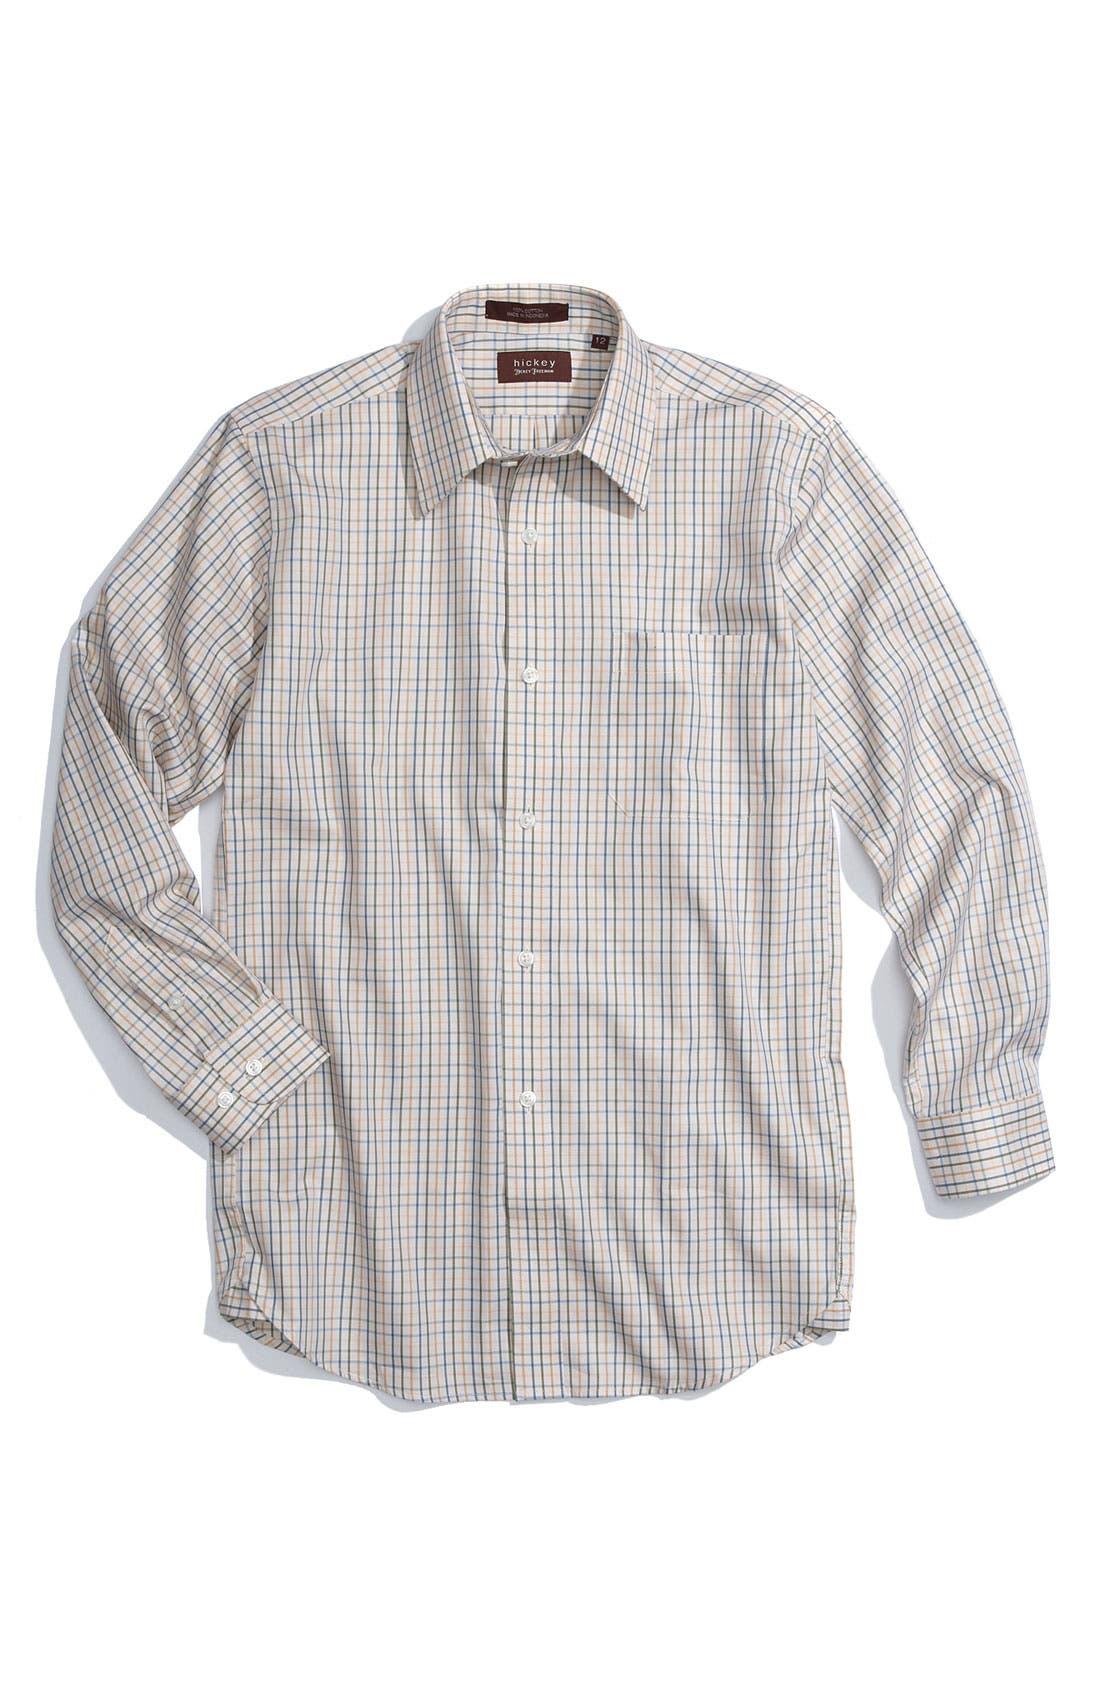 Alternate Image 1 Selected - Hickey Freeman Tattersall Sport Shirt (Big Boys)